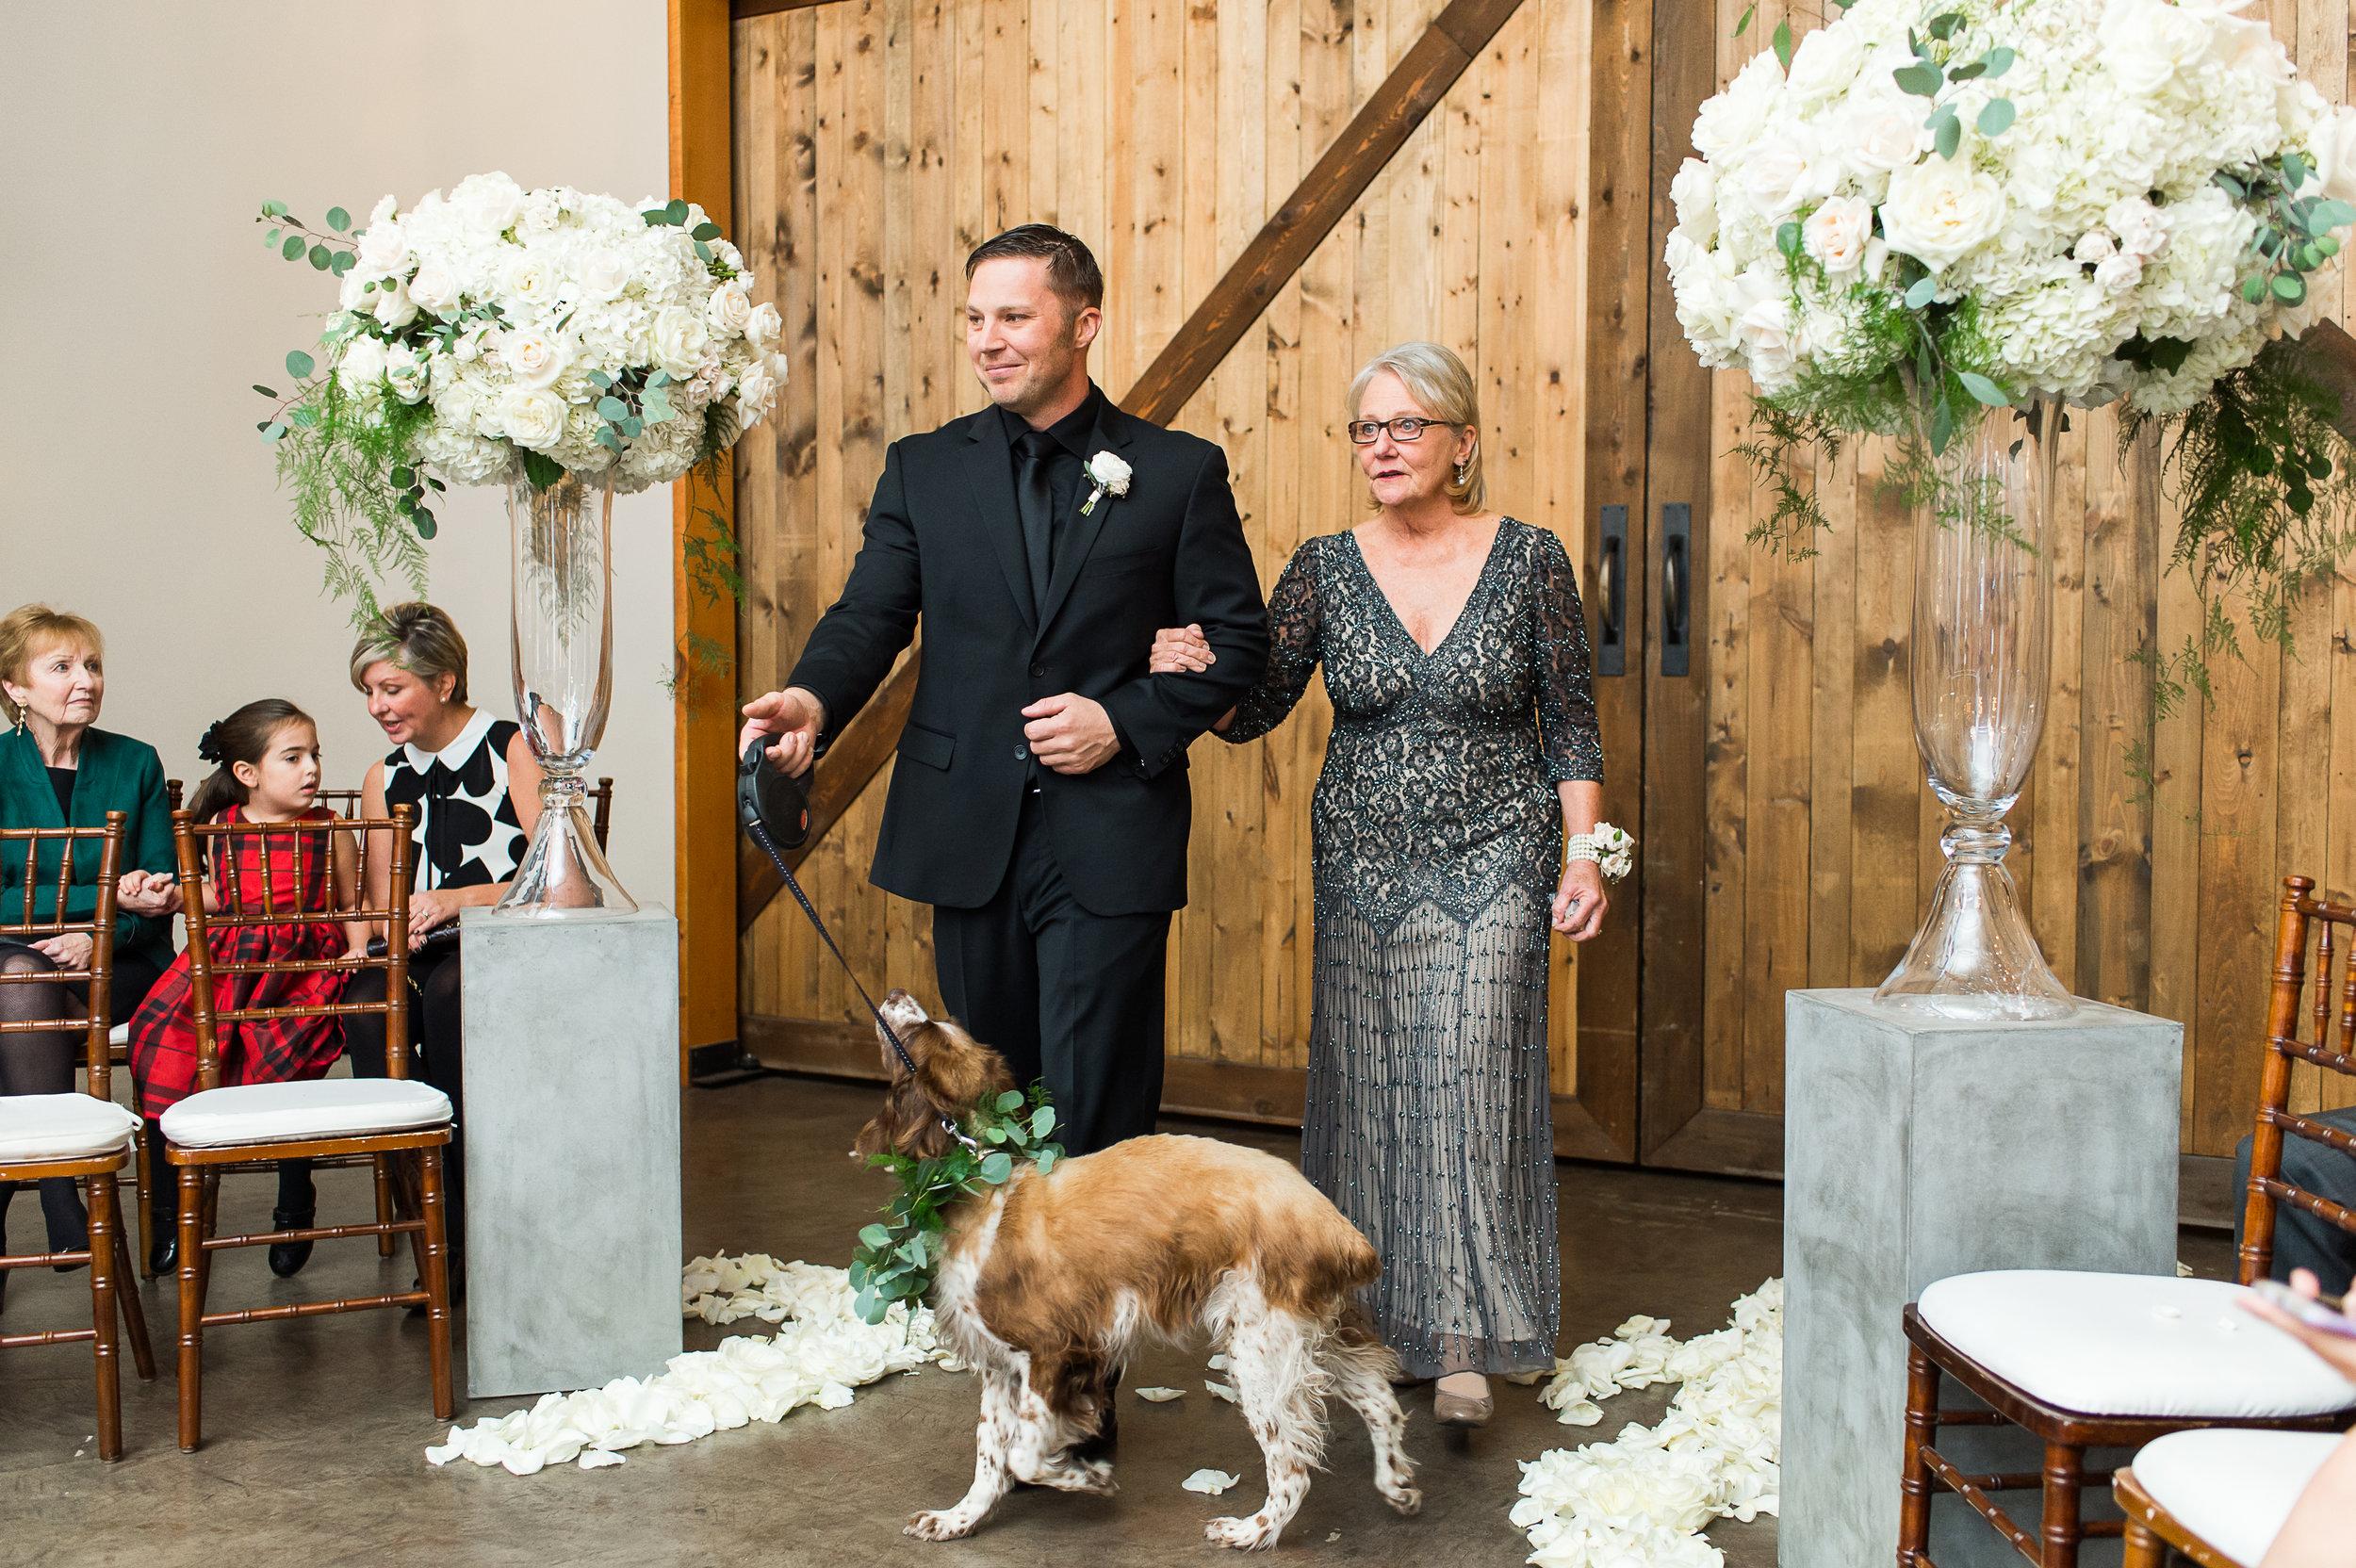 JJ-wedding-Van-Wyhe-Photography-326.jpg